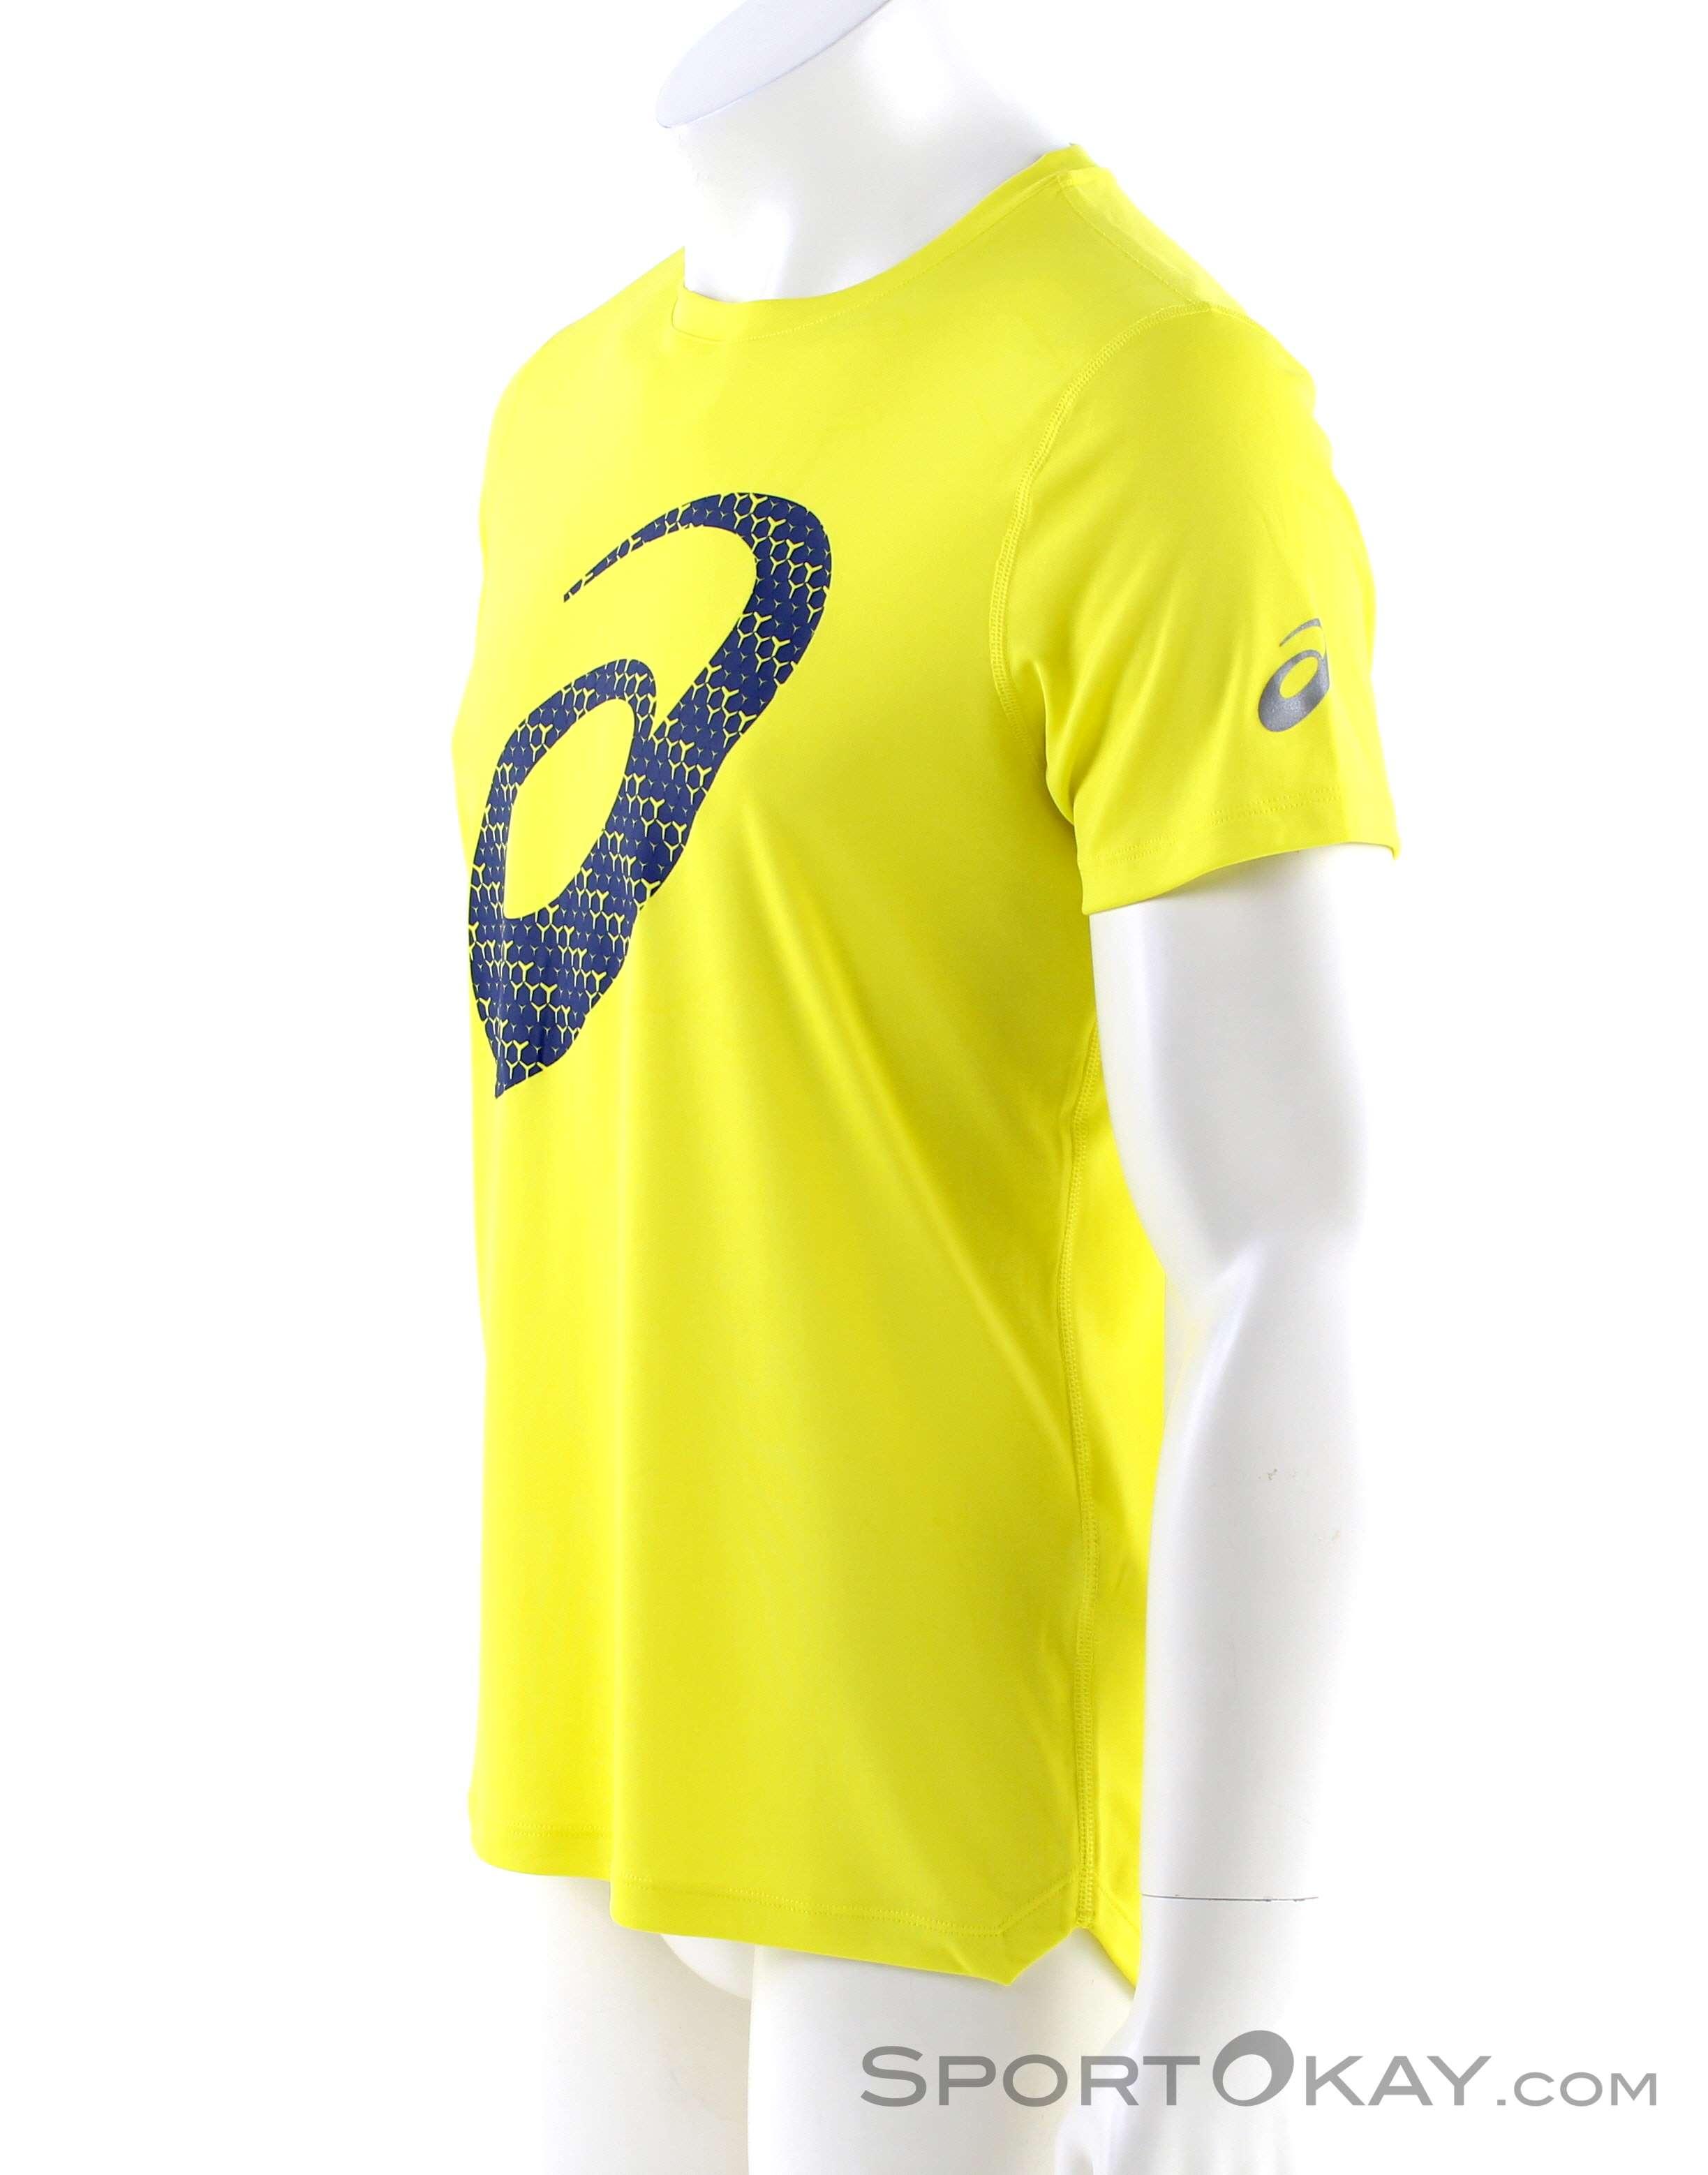 Asics Asics Silver Graphic SS Mens T Shirt